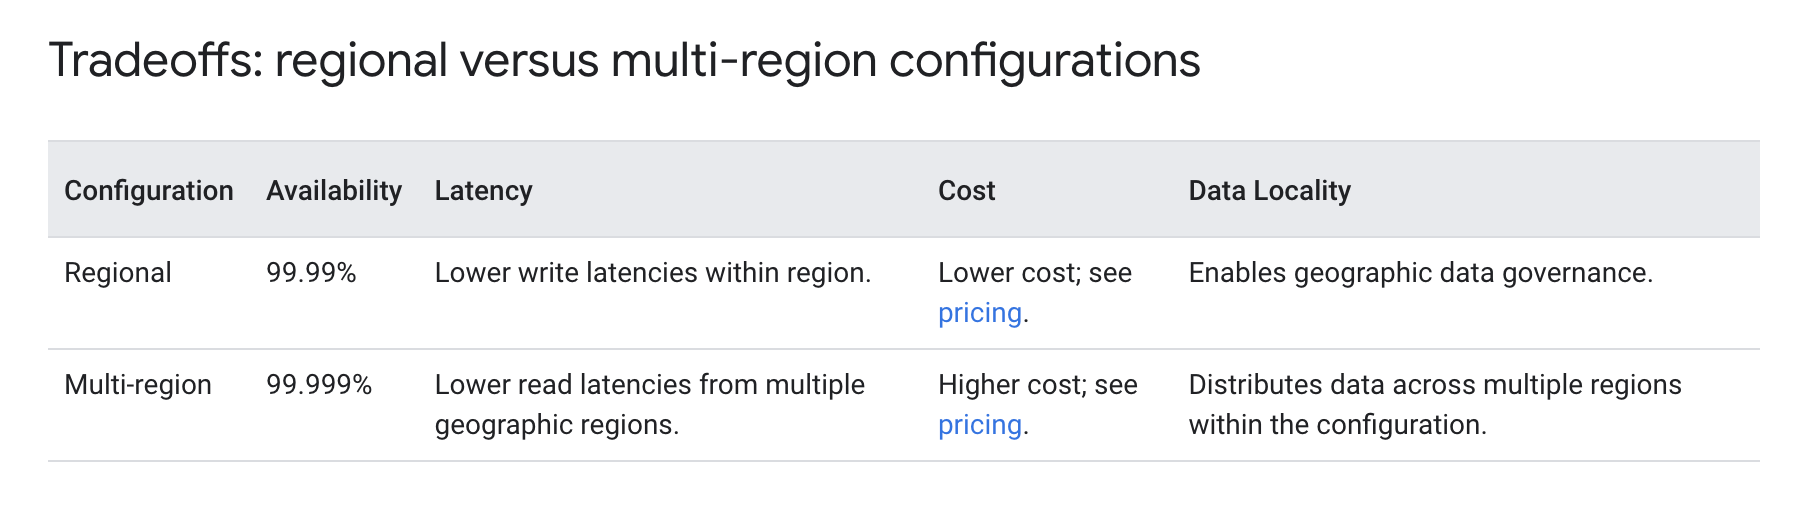 Cloud Spanner - Regional vs Multi-Regional Configurations